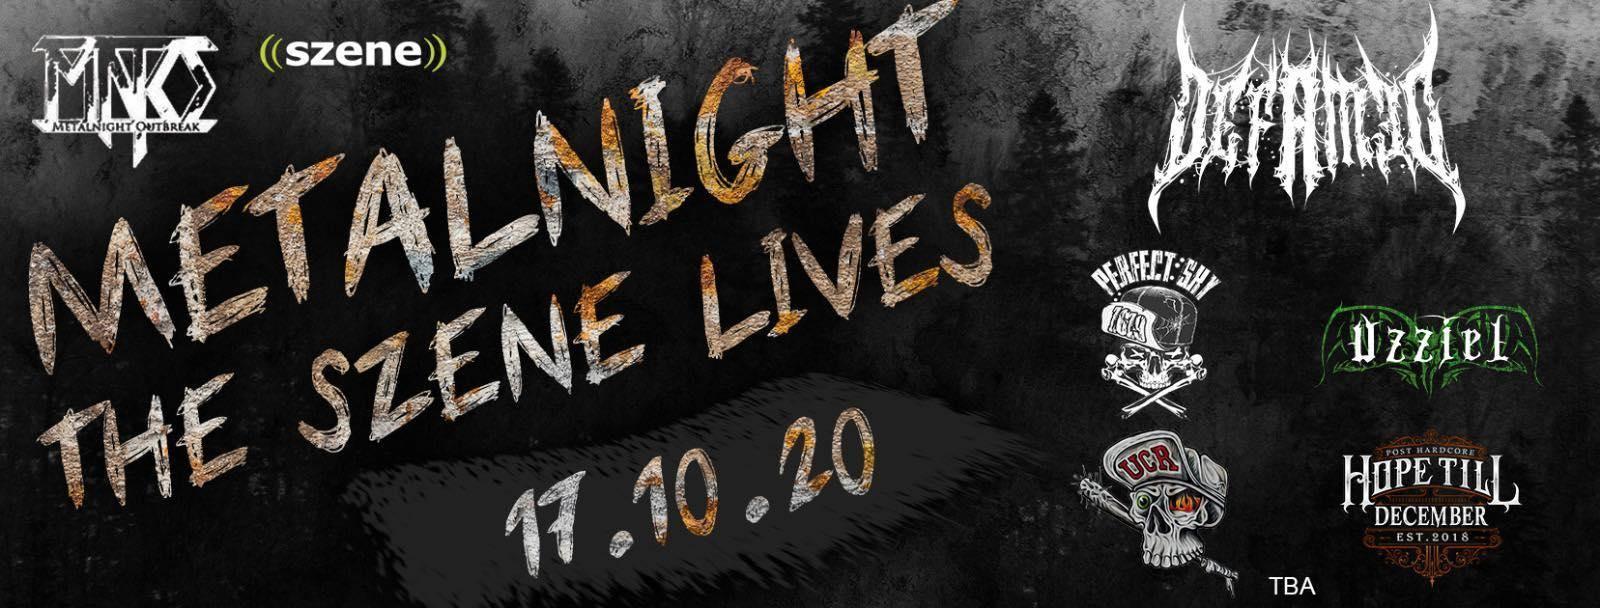 Metalnight - The Szene Lives am 17. October 2020 @ Szene Wien.